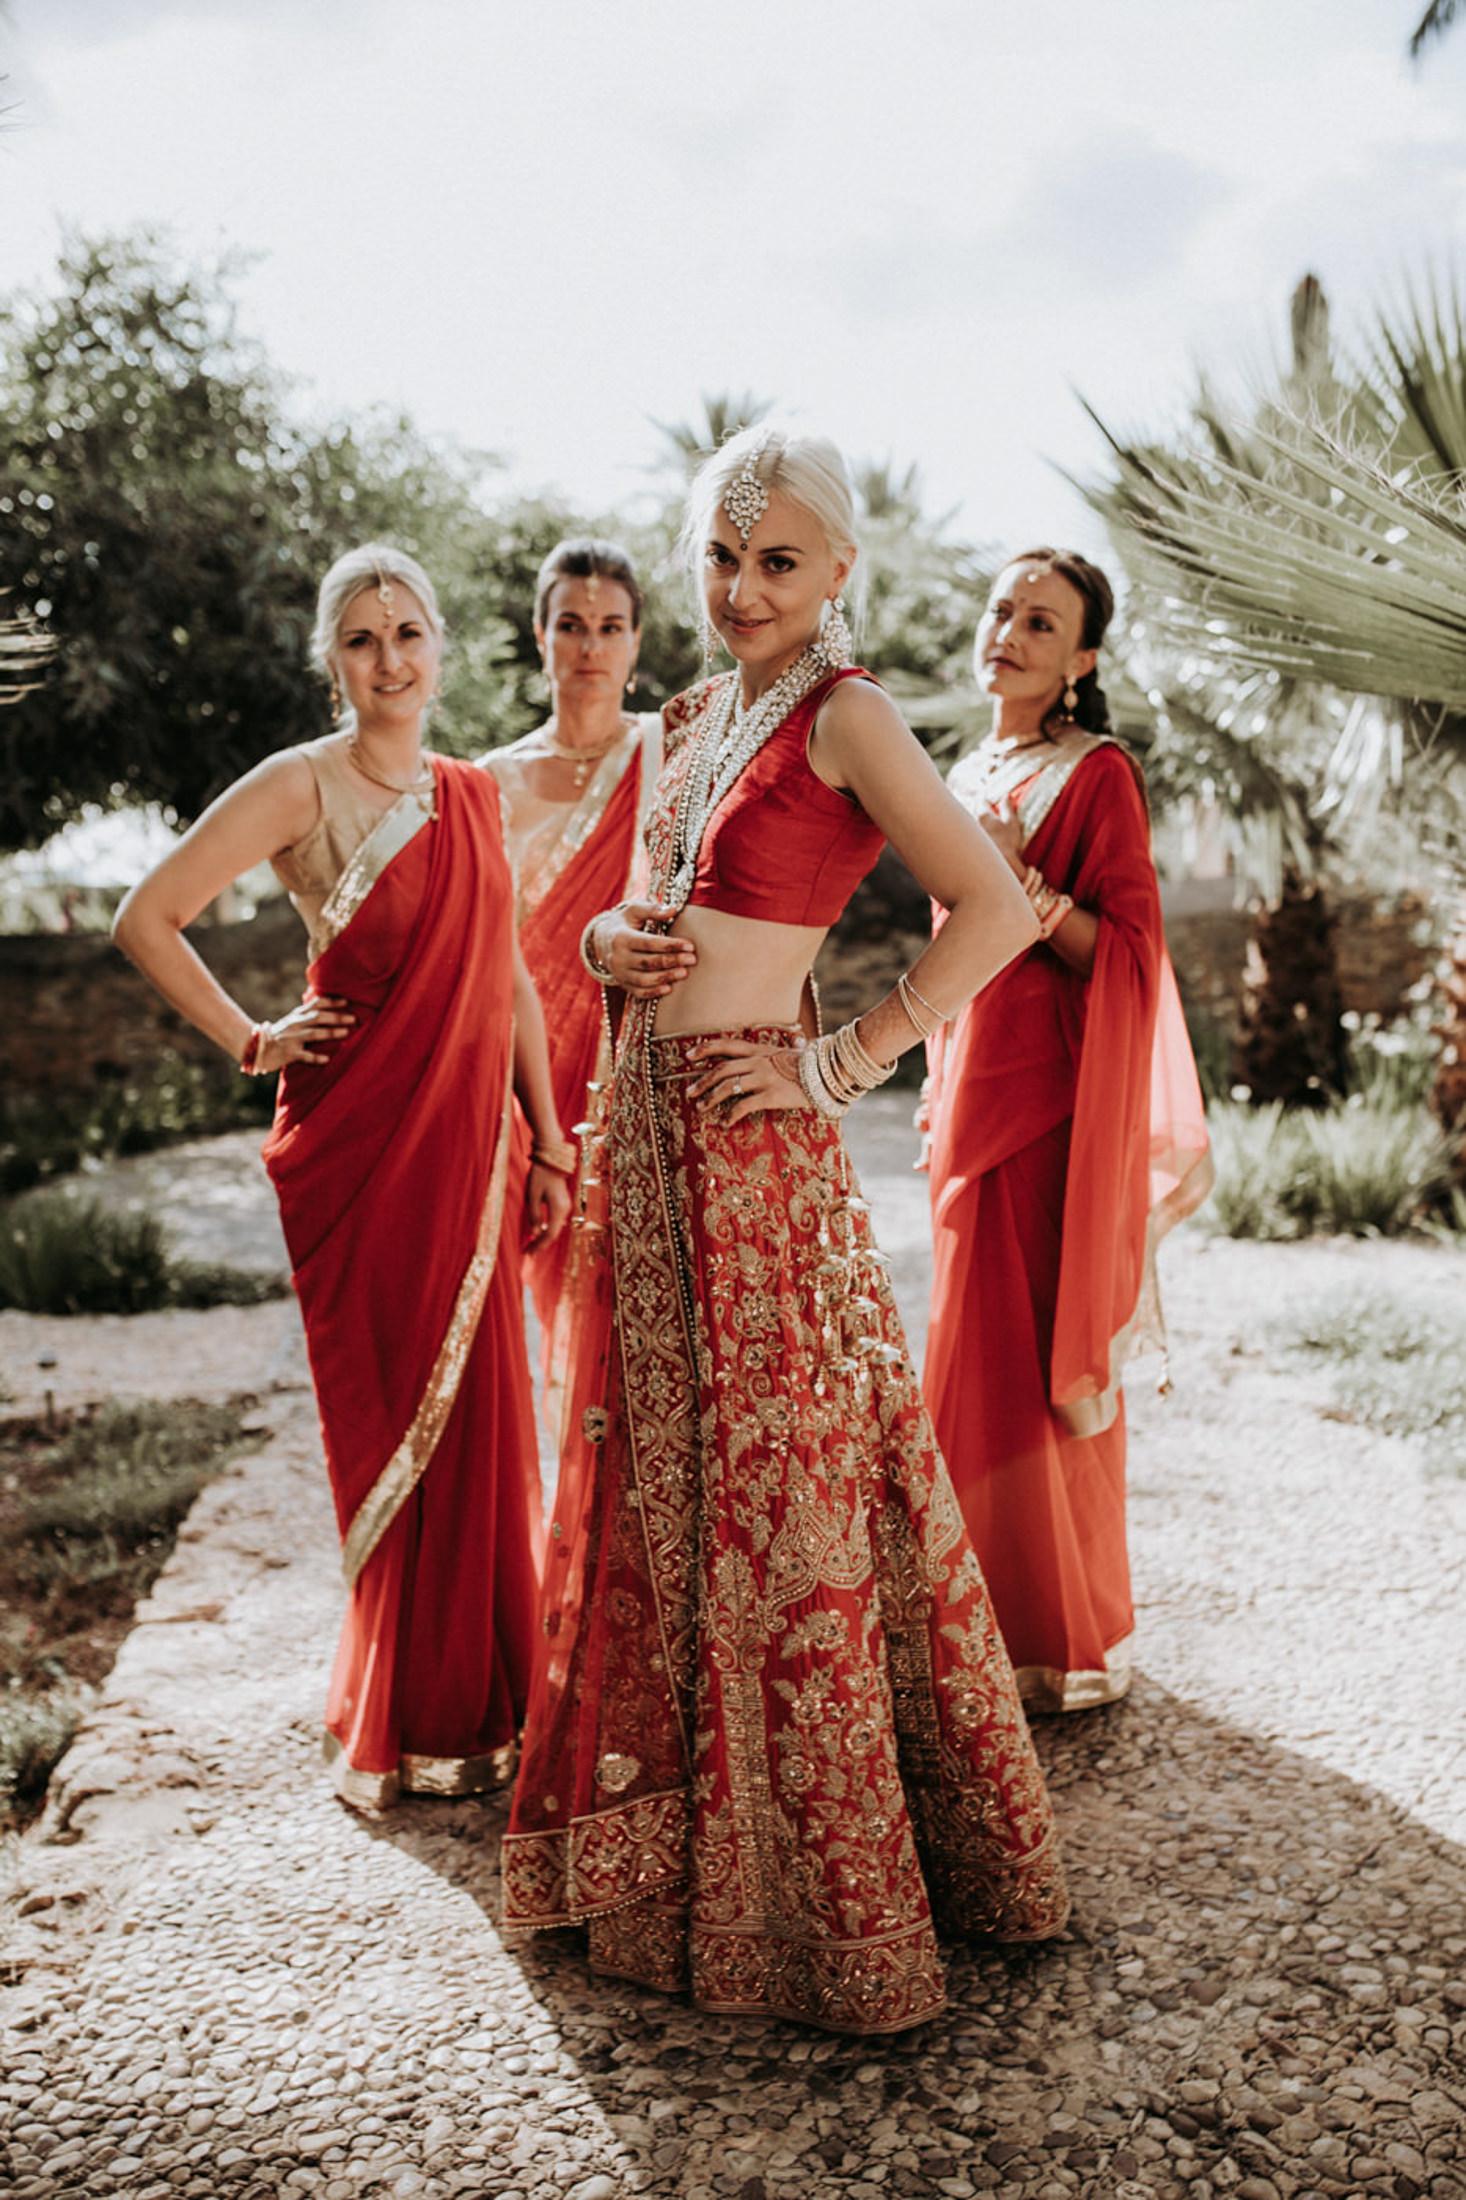 Wedding_Photographer_Mallorca_Daniela-Marquardt_Photography_New_York_Iceland_Tuscany_Santorini_Portugal_Austria_Bavaria_Elopement_Hochzeitsfotograf_AntjeRajat2_56